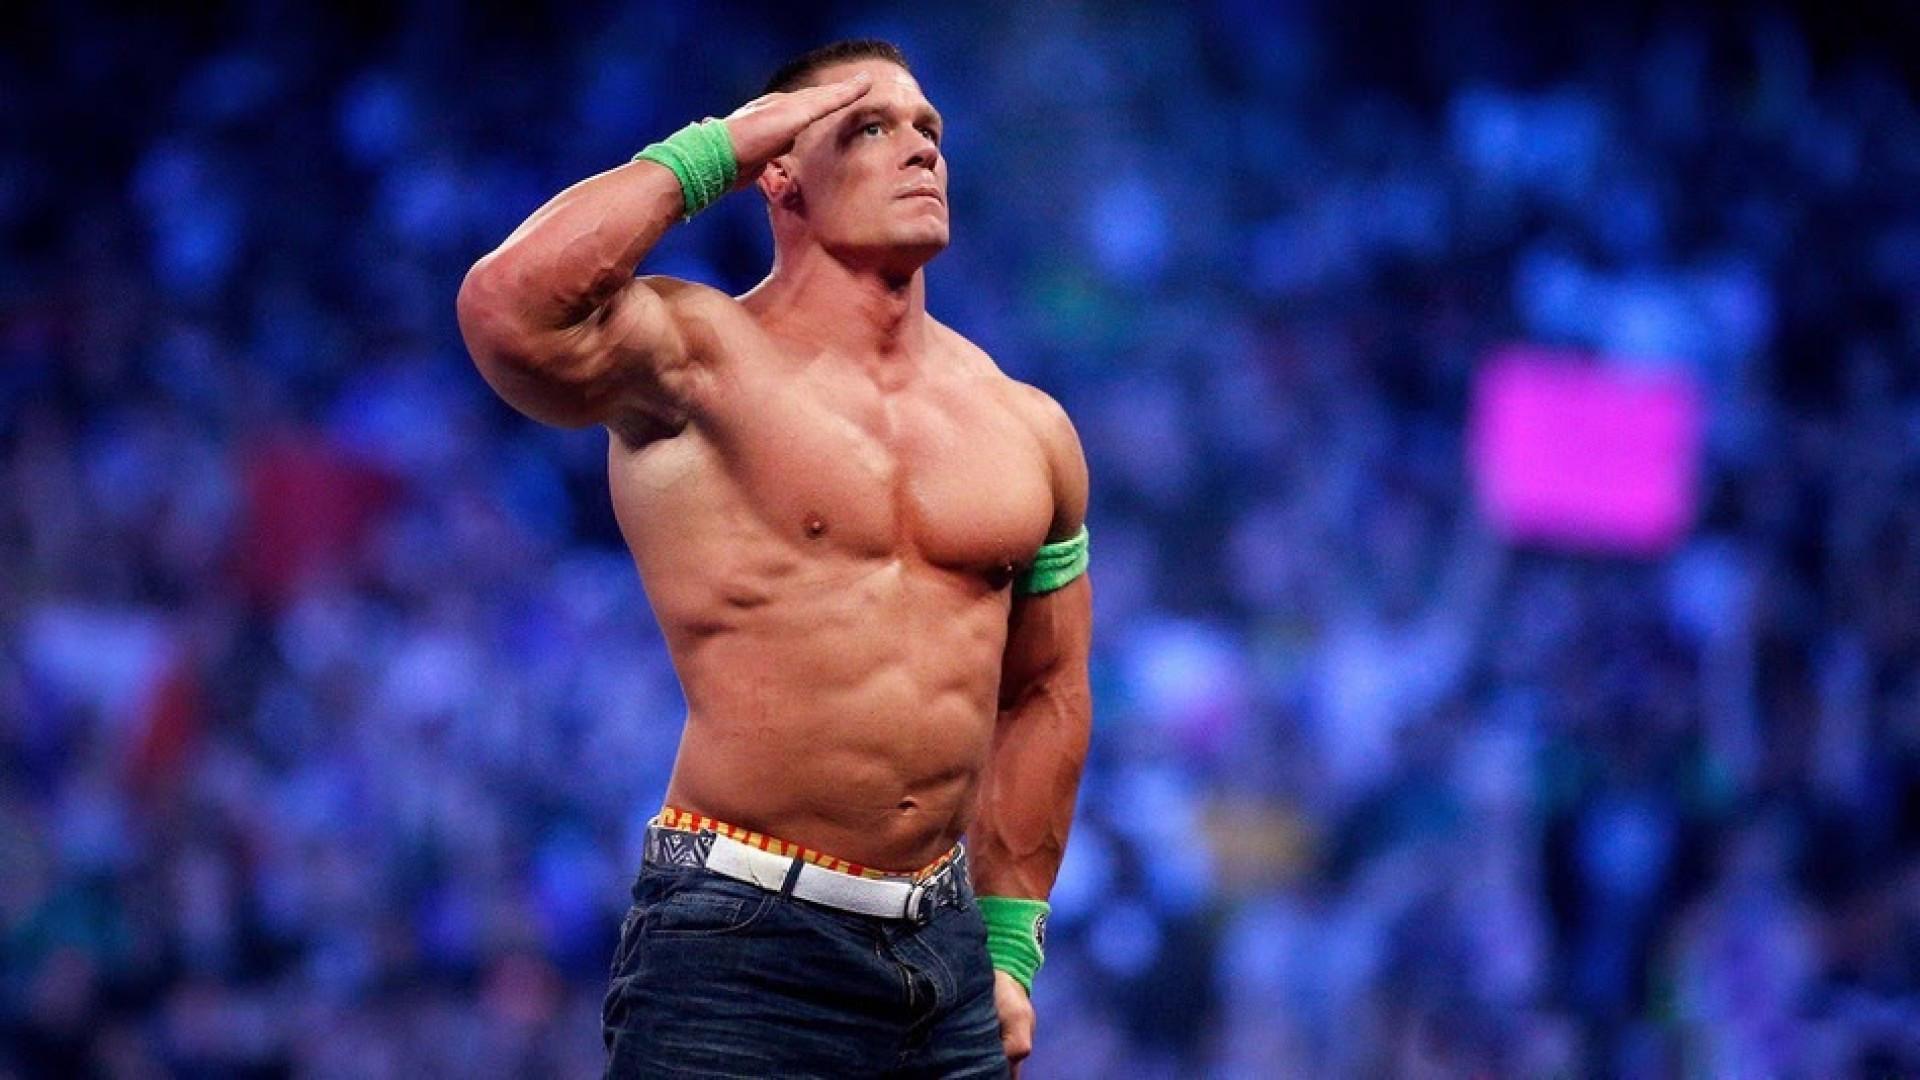 Wwe John Cena Wallpaper 2018 55 Images